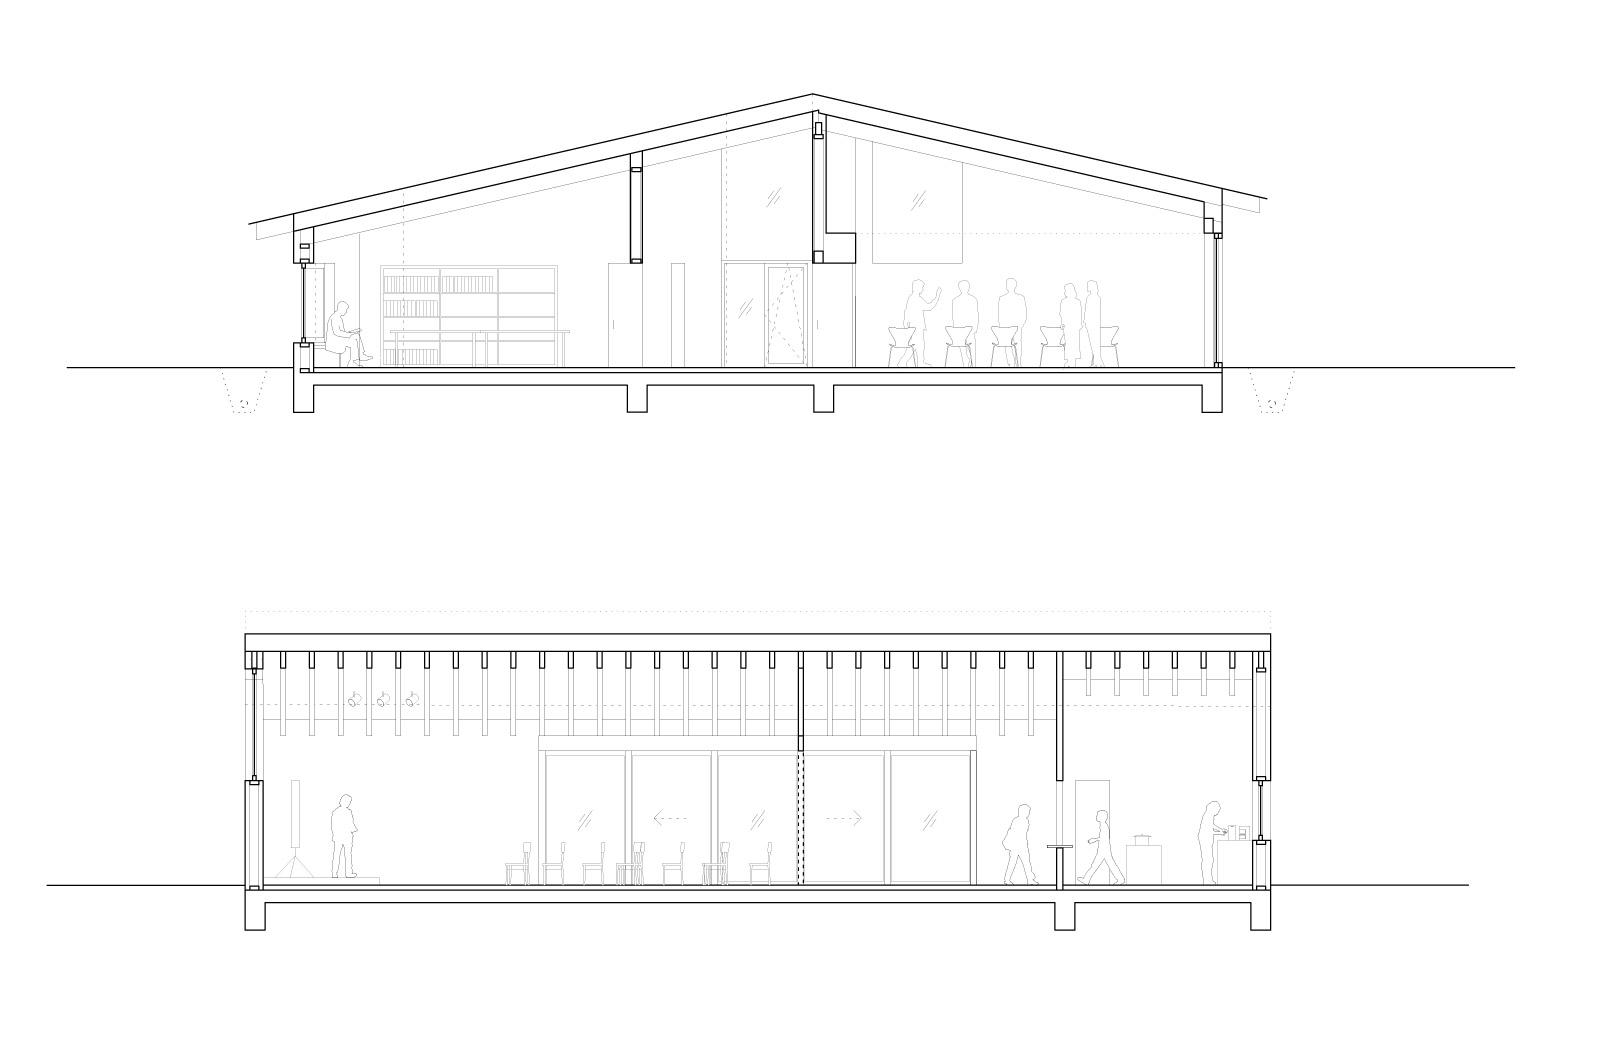 Atelier-Fanelsa-9-Sections